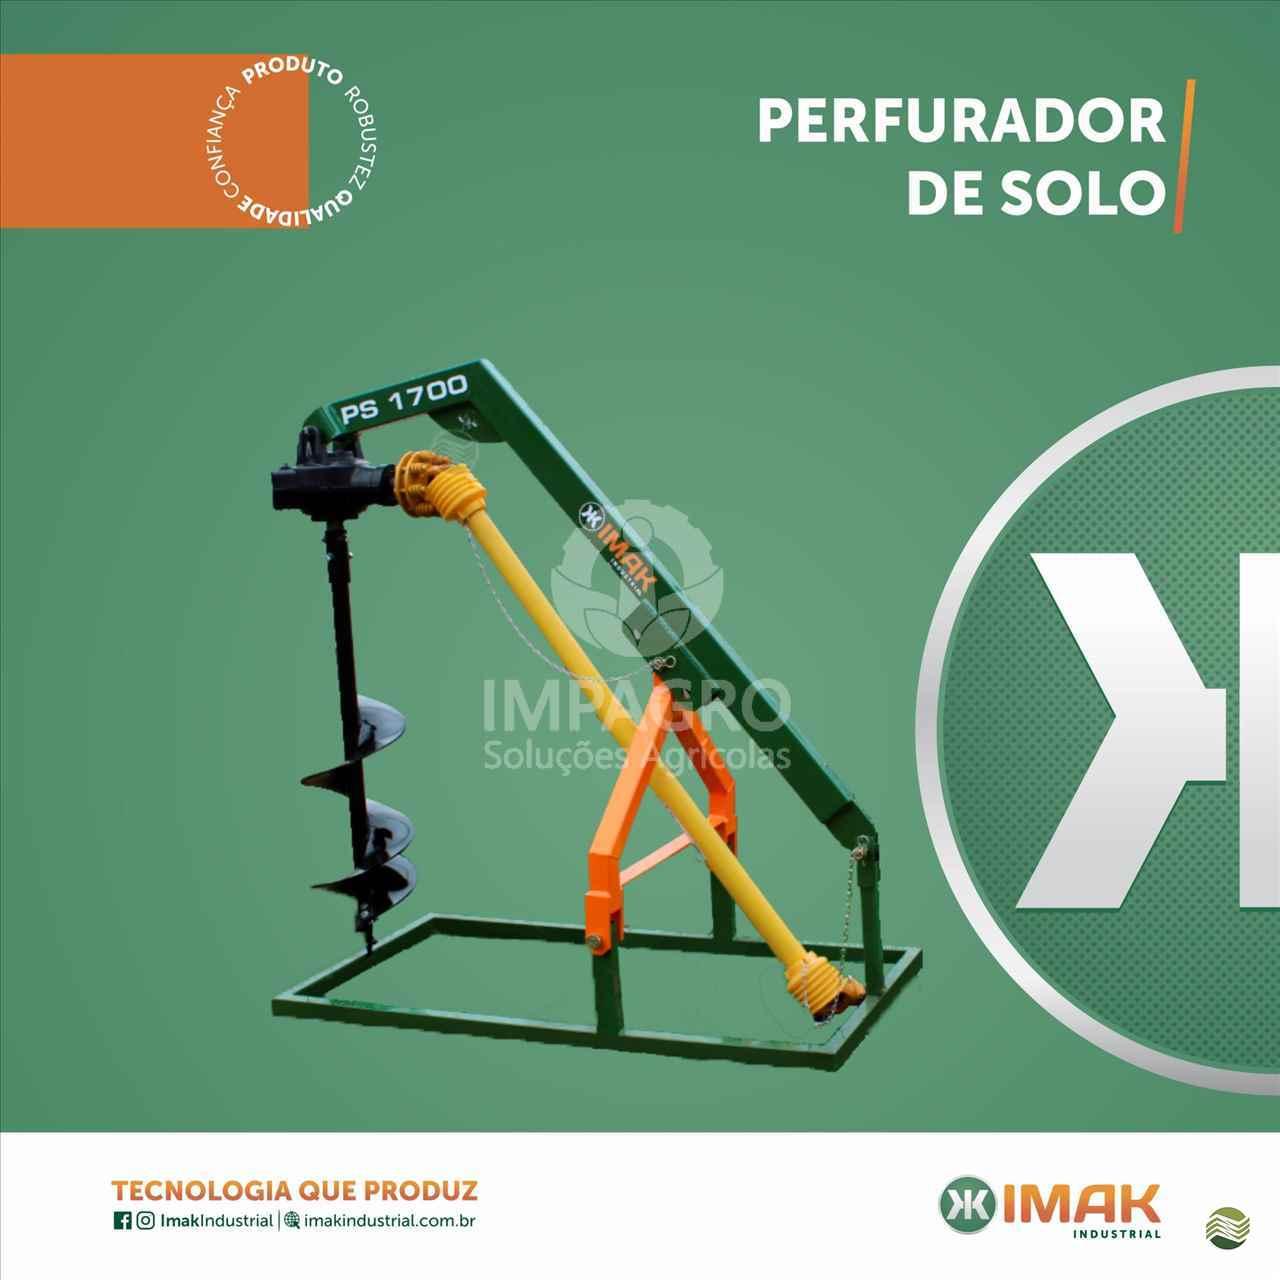 IMPLEMENTOS AGRICOLAS PERFURADOR SOLO PERFURADOR DE SOLO Impagro Soluções Agrícolas AJURICABA RIO GRANDE DO SUL RS